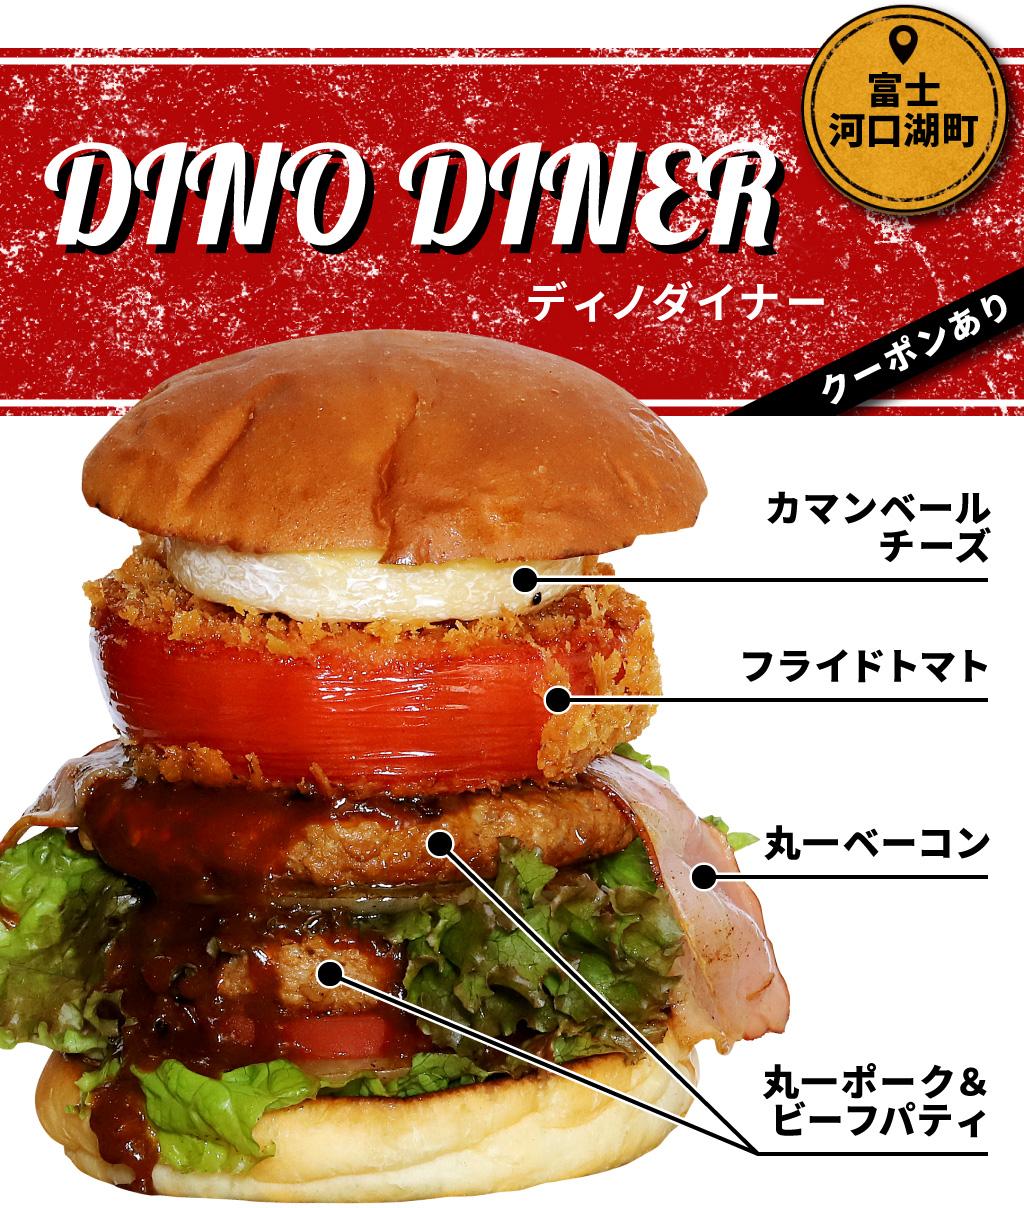 DINO DINER(ディノダイナー)-富士河口湖町